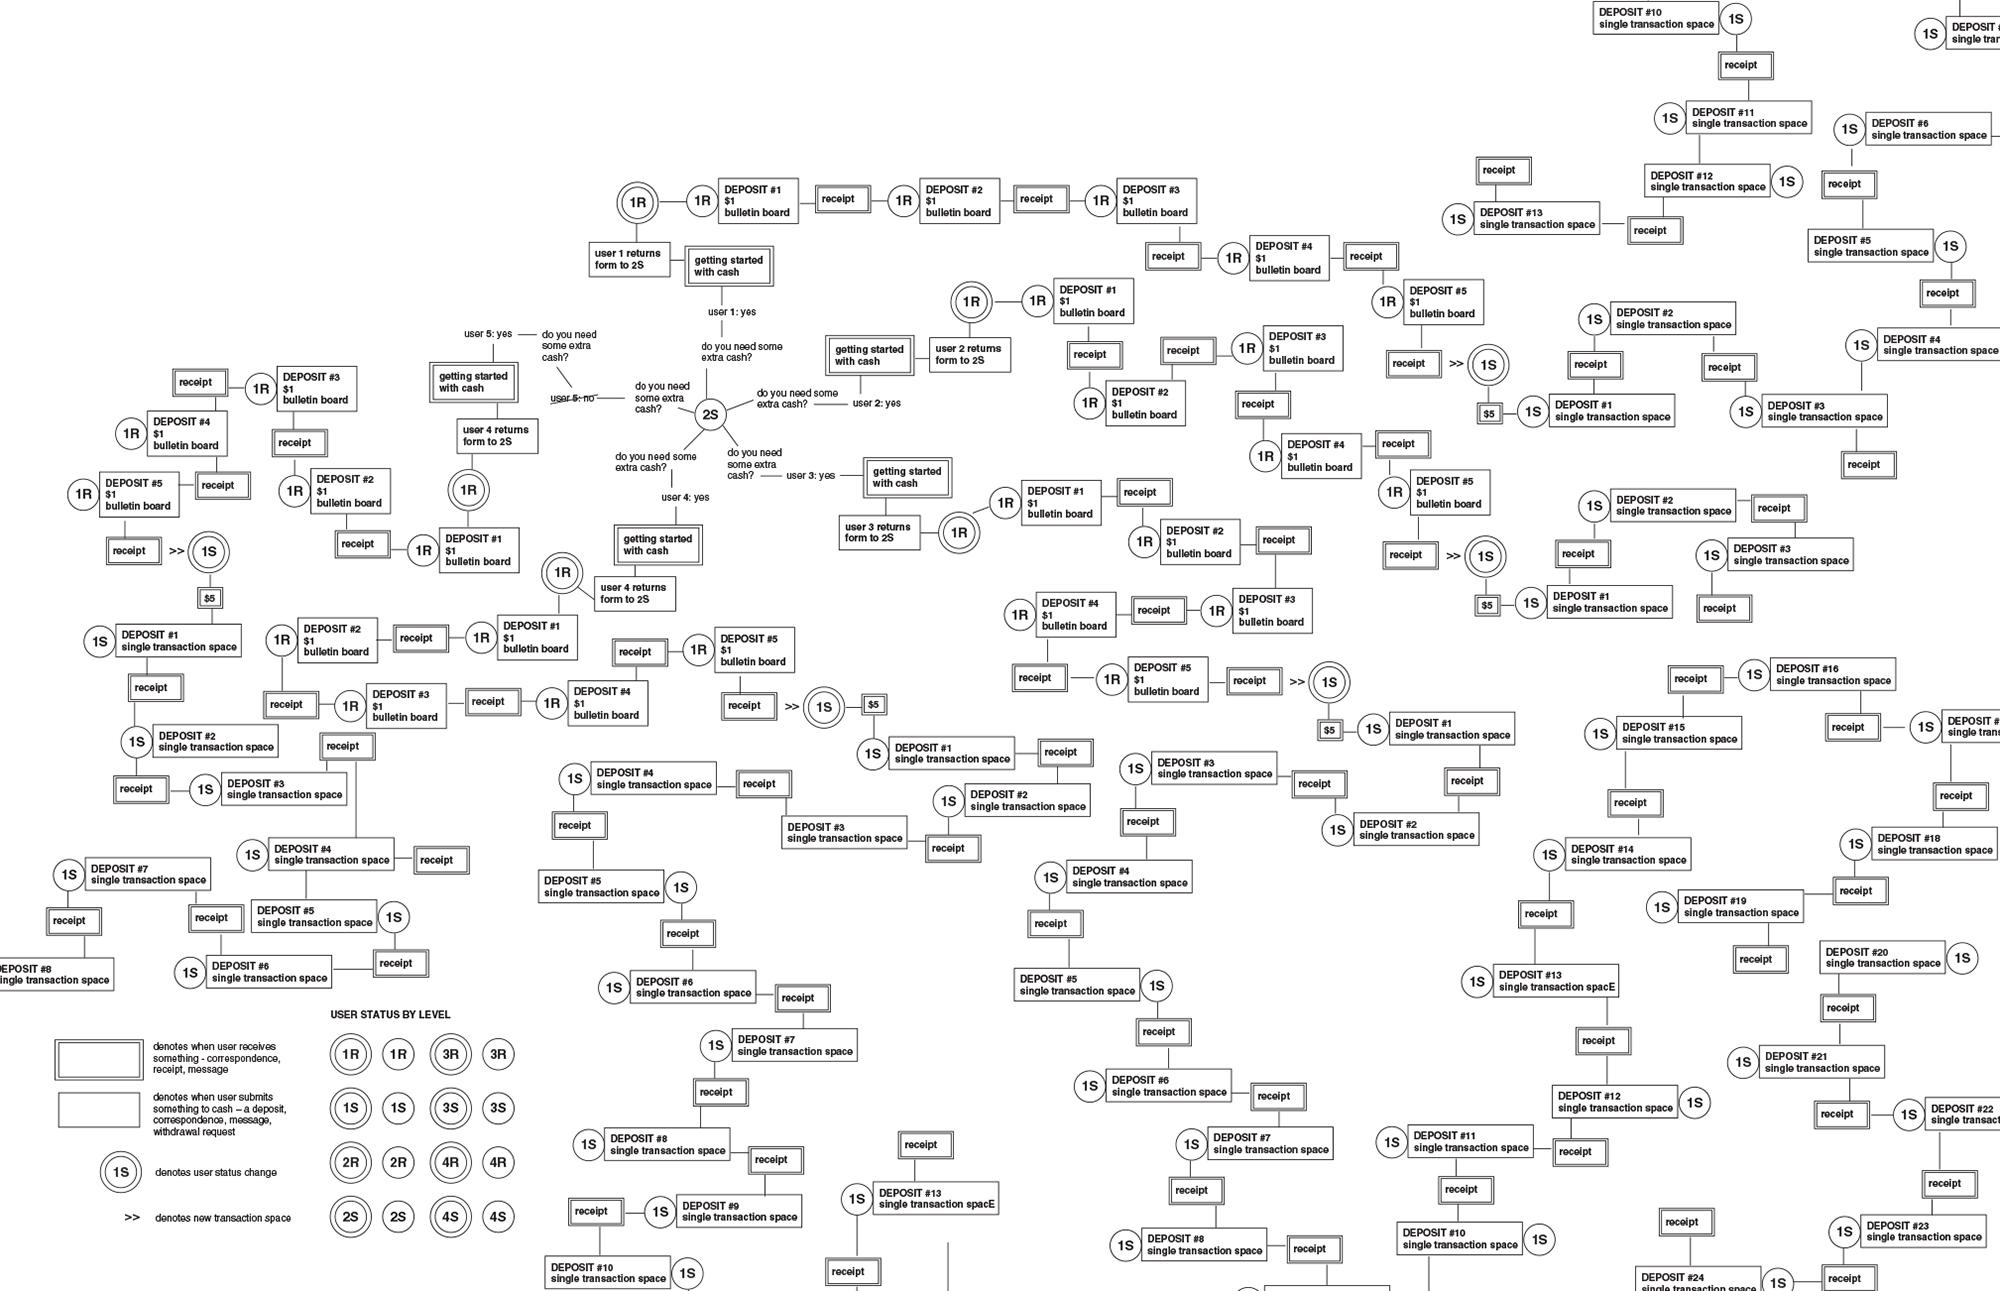 CASH_transaction_map.jpg